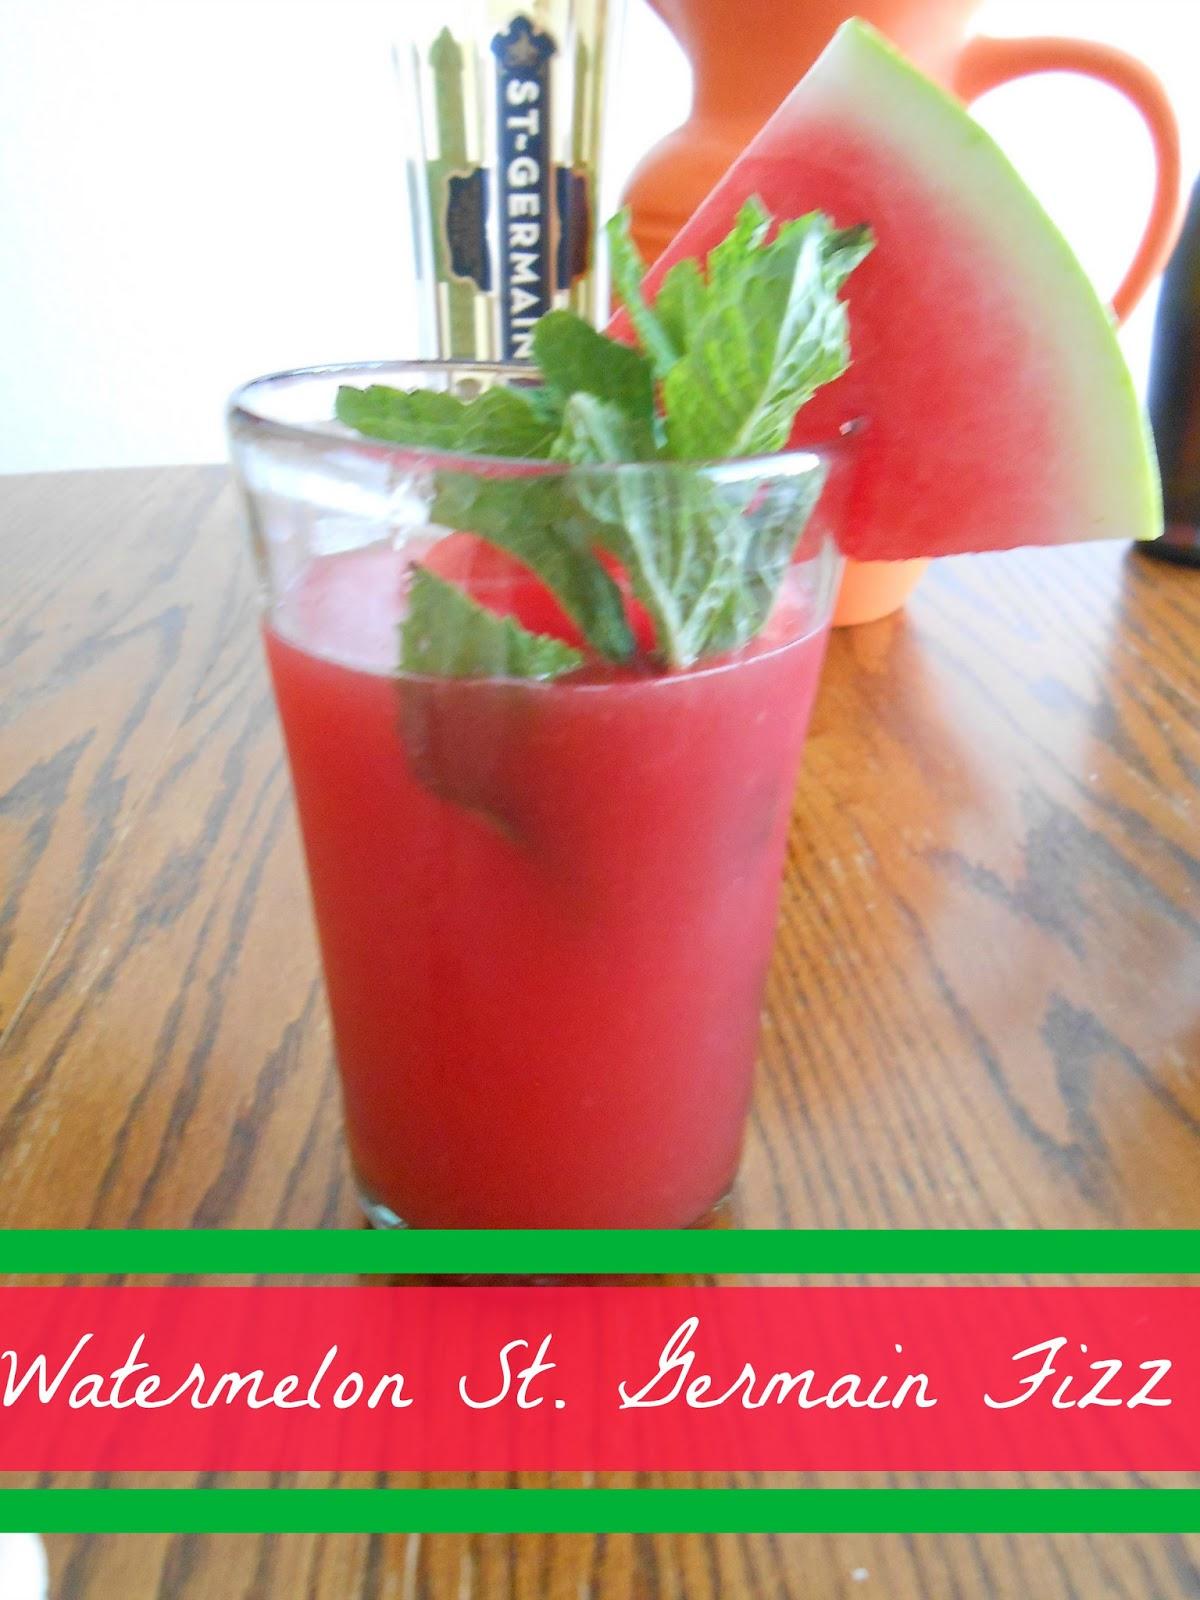 watermelon st germain fizz vegan brunch menu flora foodie